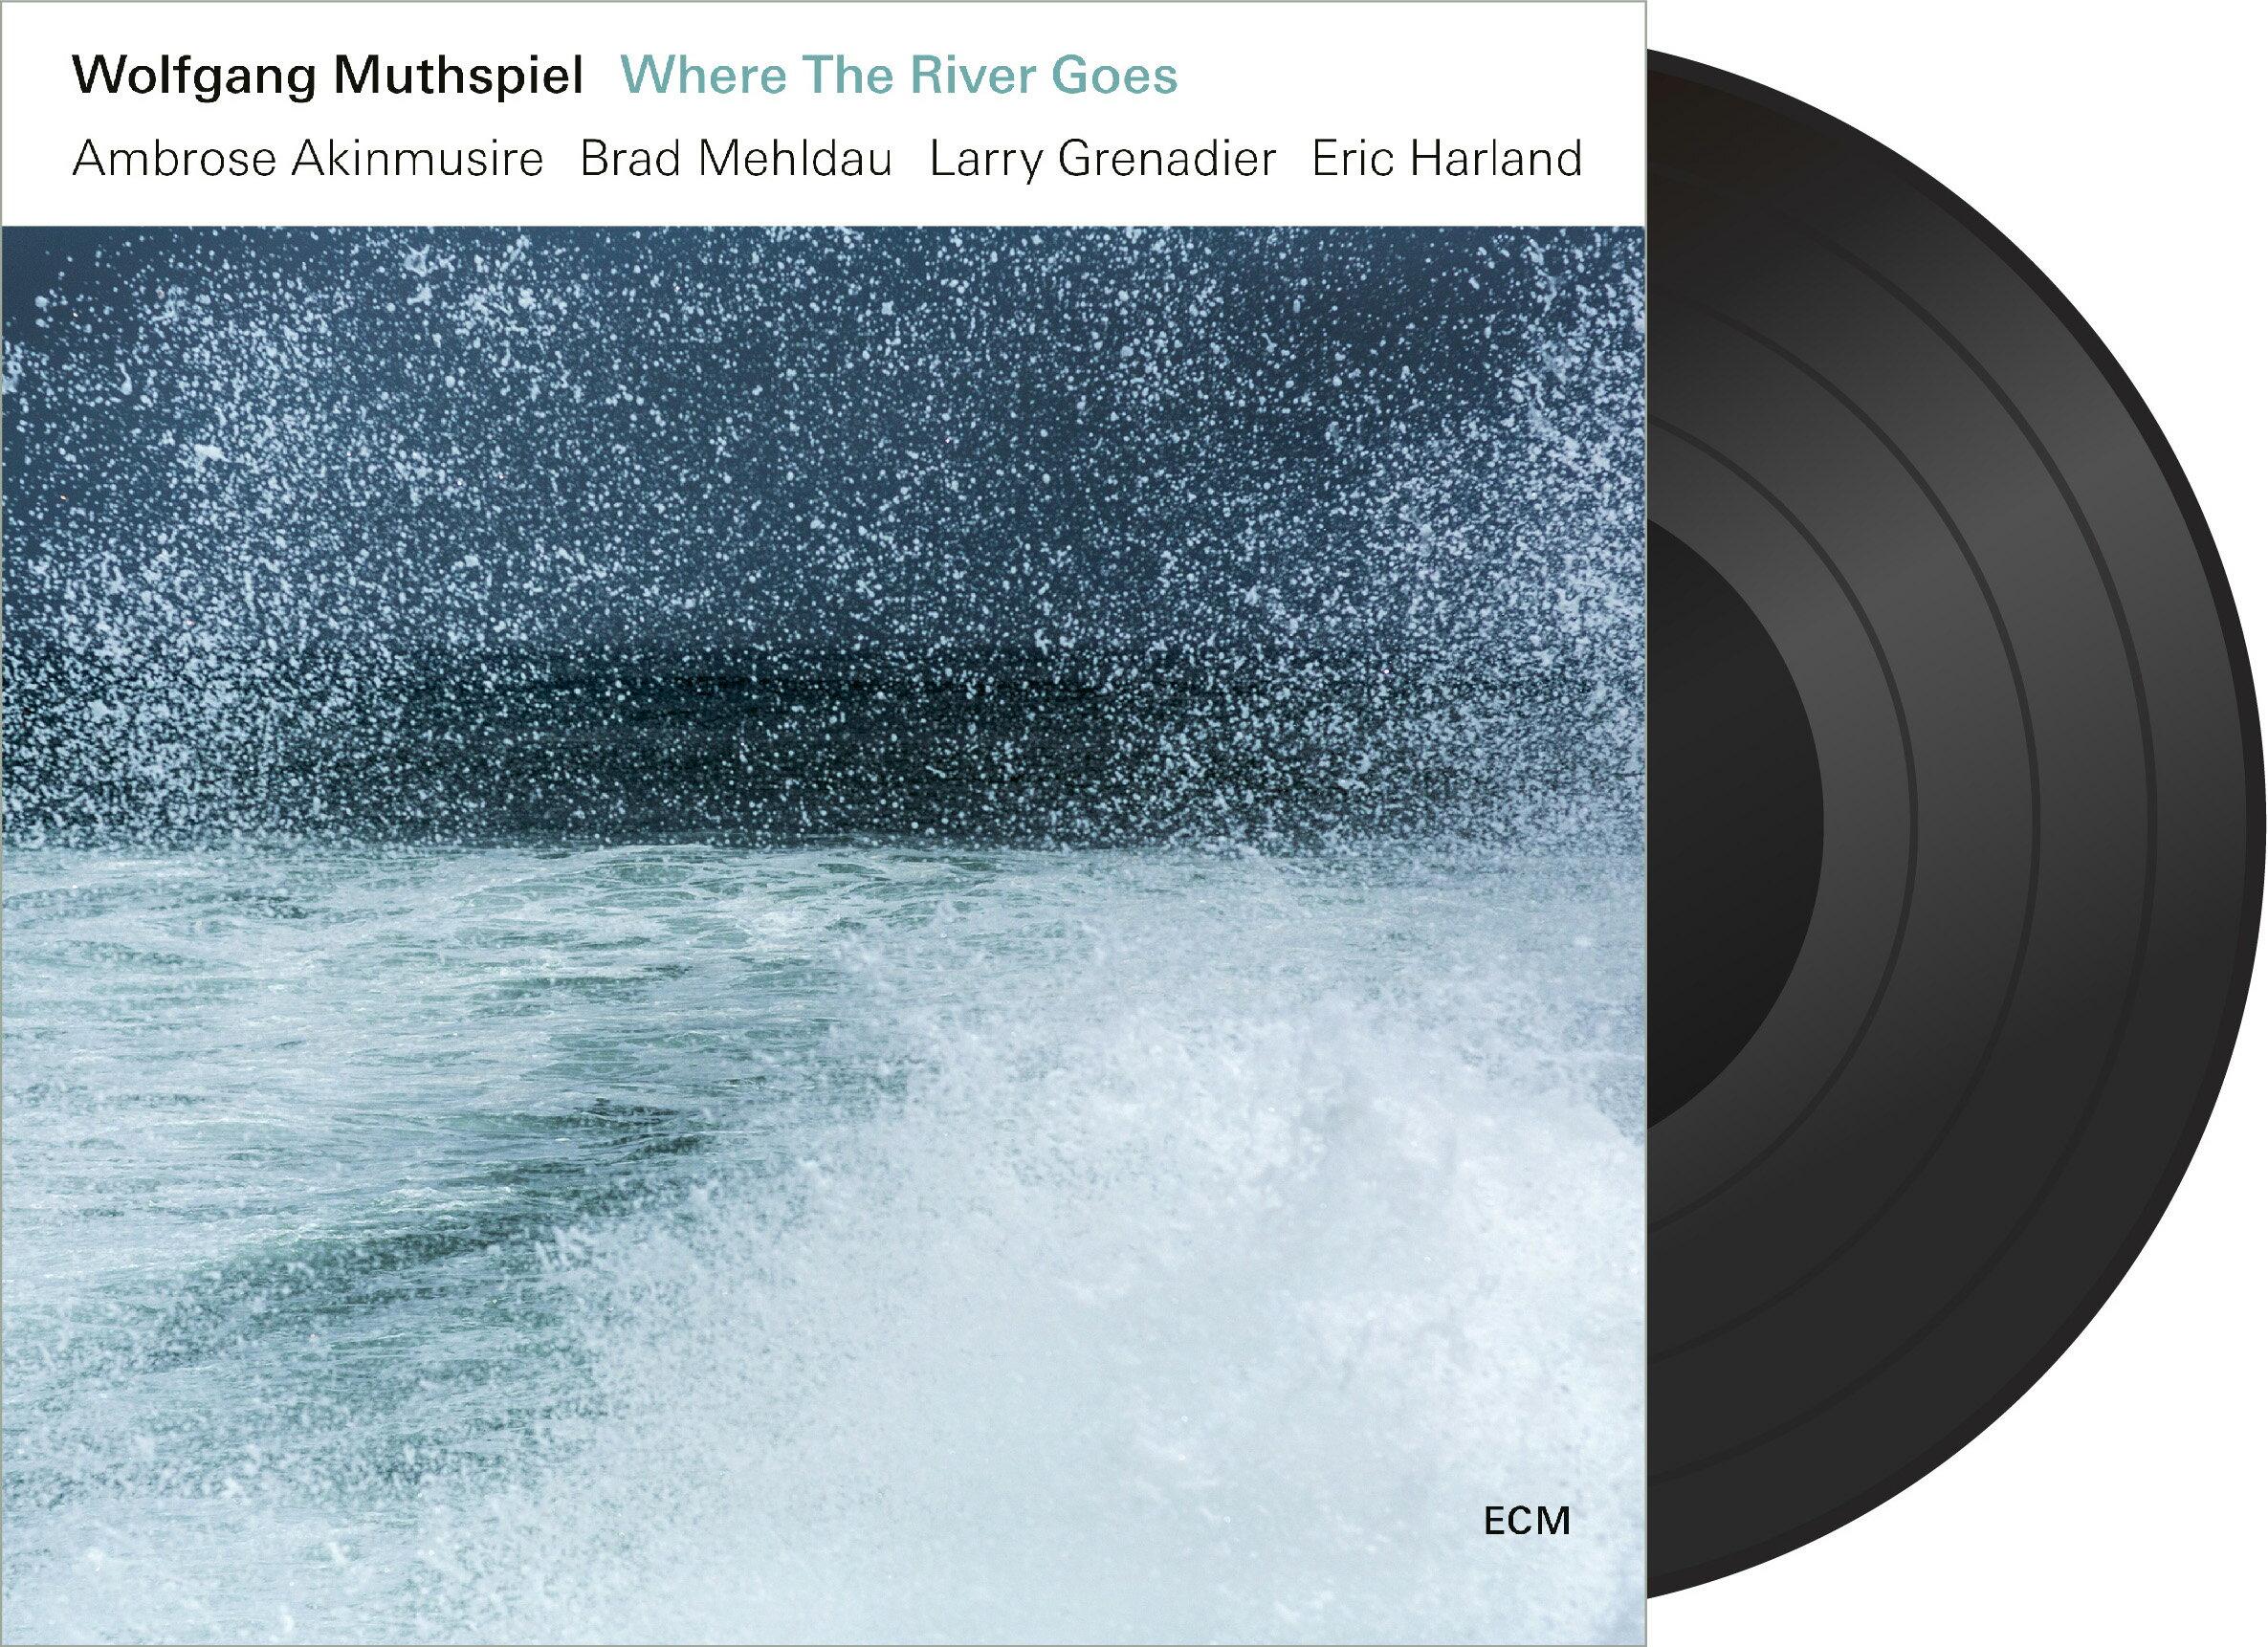 沃爾夫岡.馬斯俾爾:大江入海 Wolfgang Muthspiel: Where The River Goes (Vinyl LP) 【ECM】 1